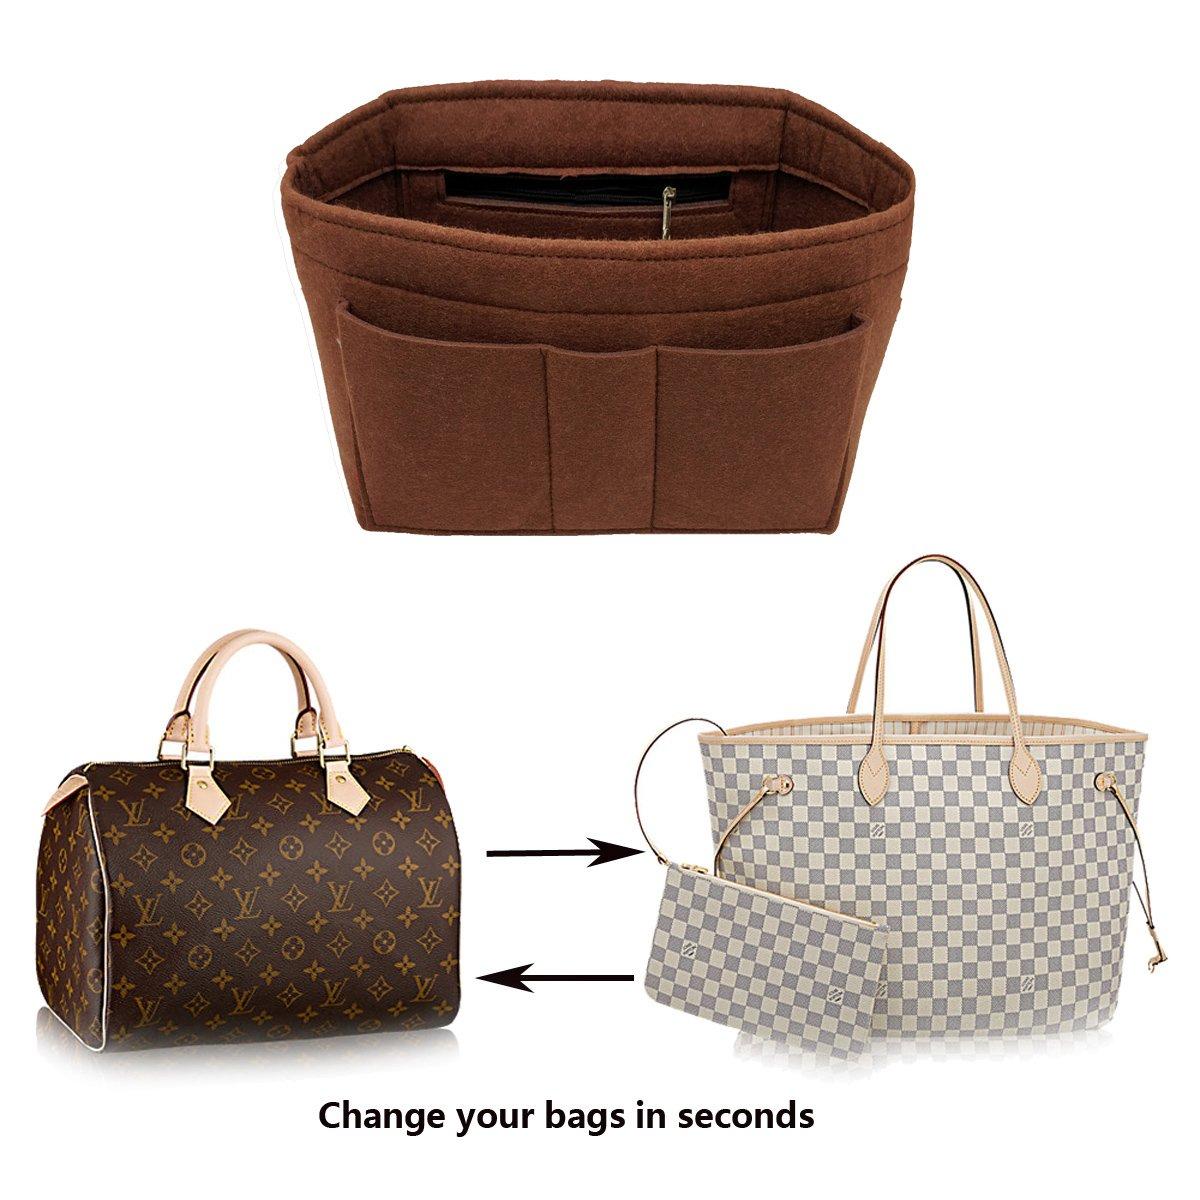 LEXSION Felt Insert Fabric Purse Organizer Bag, Bag Insert in Bag with Zipper Inner Pocket Brown XL by LEXSION (Image #6)